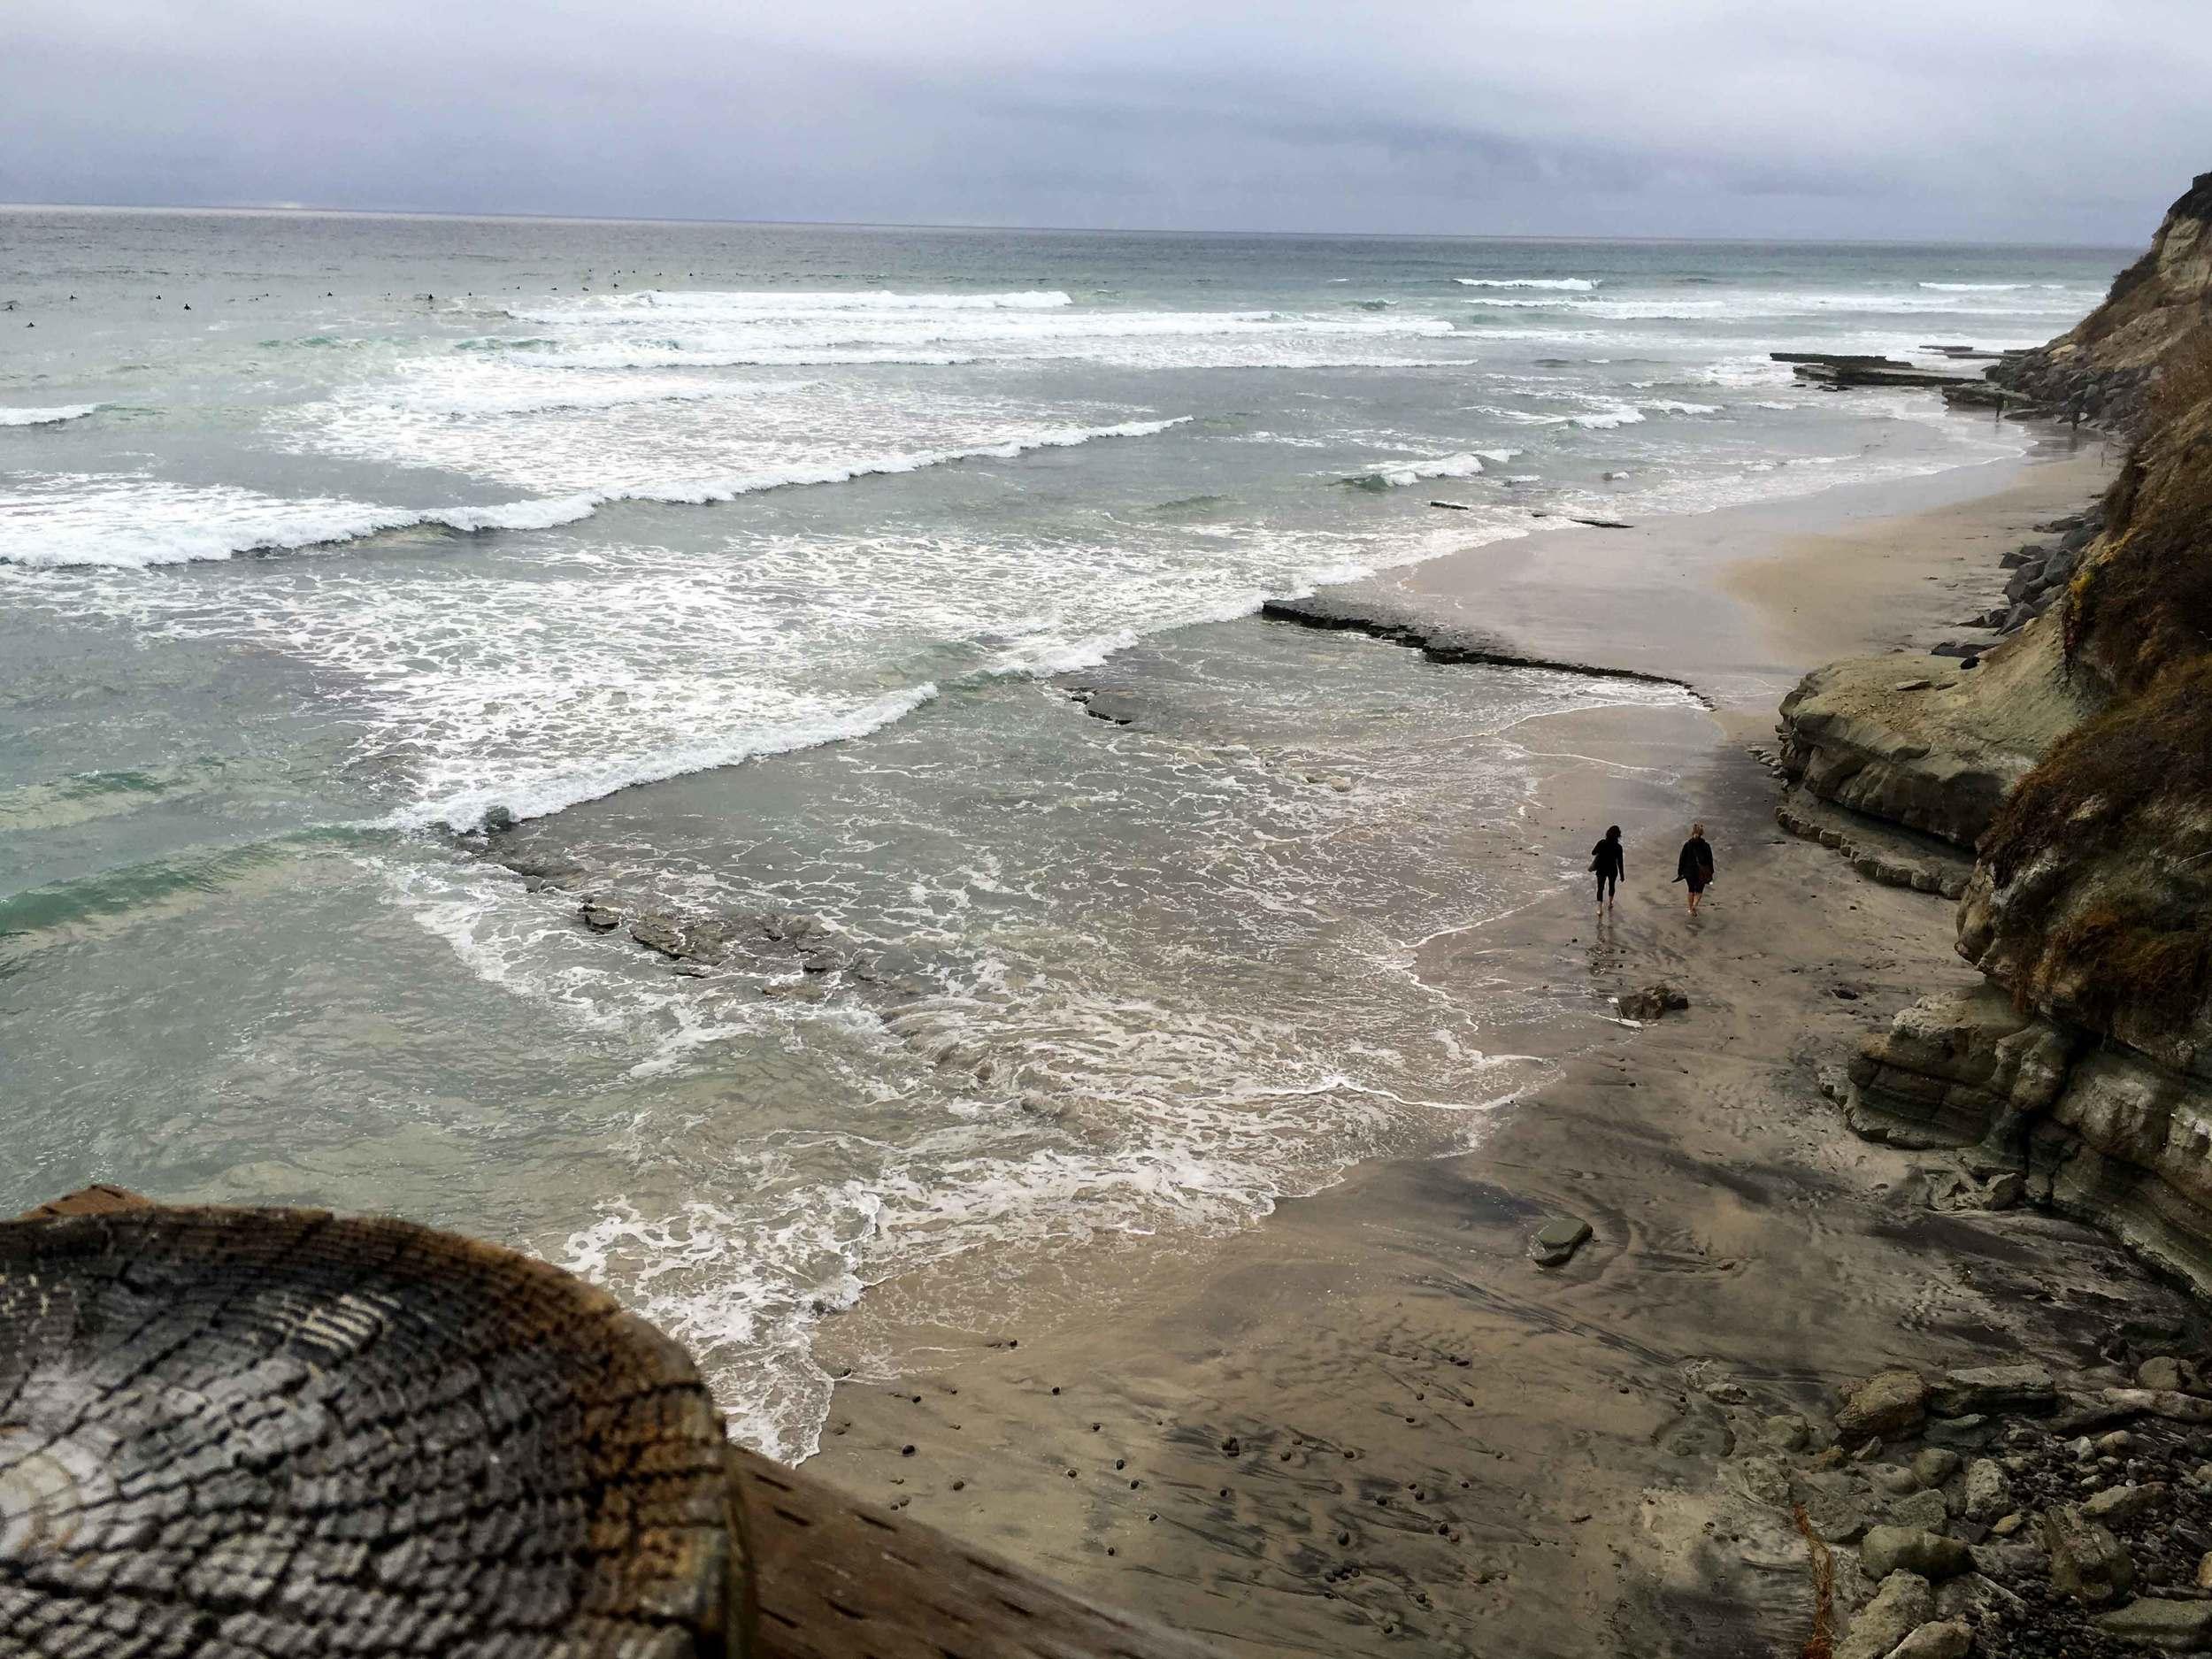 Surfers, stormy day at the ocean, ocean view, Swamis beach, Encinitas, California. Image©sourcingstyle.com